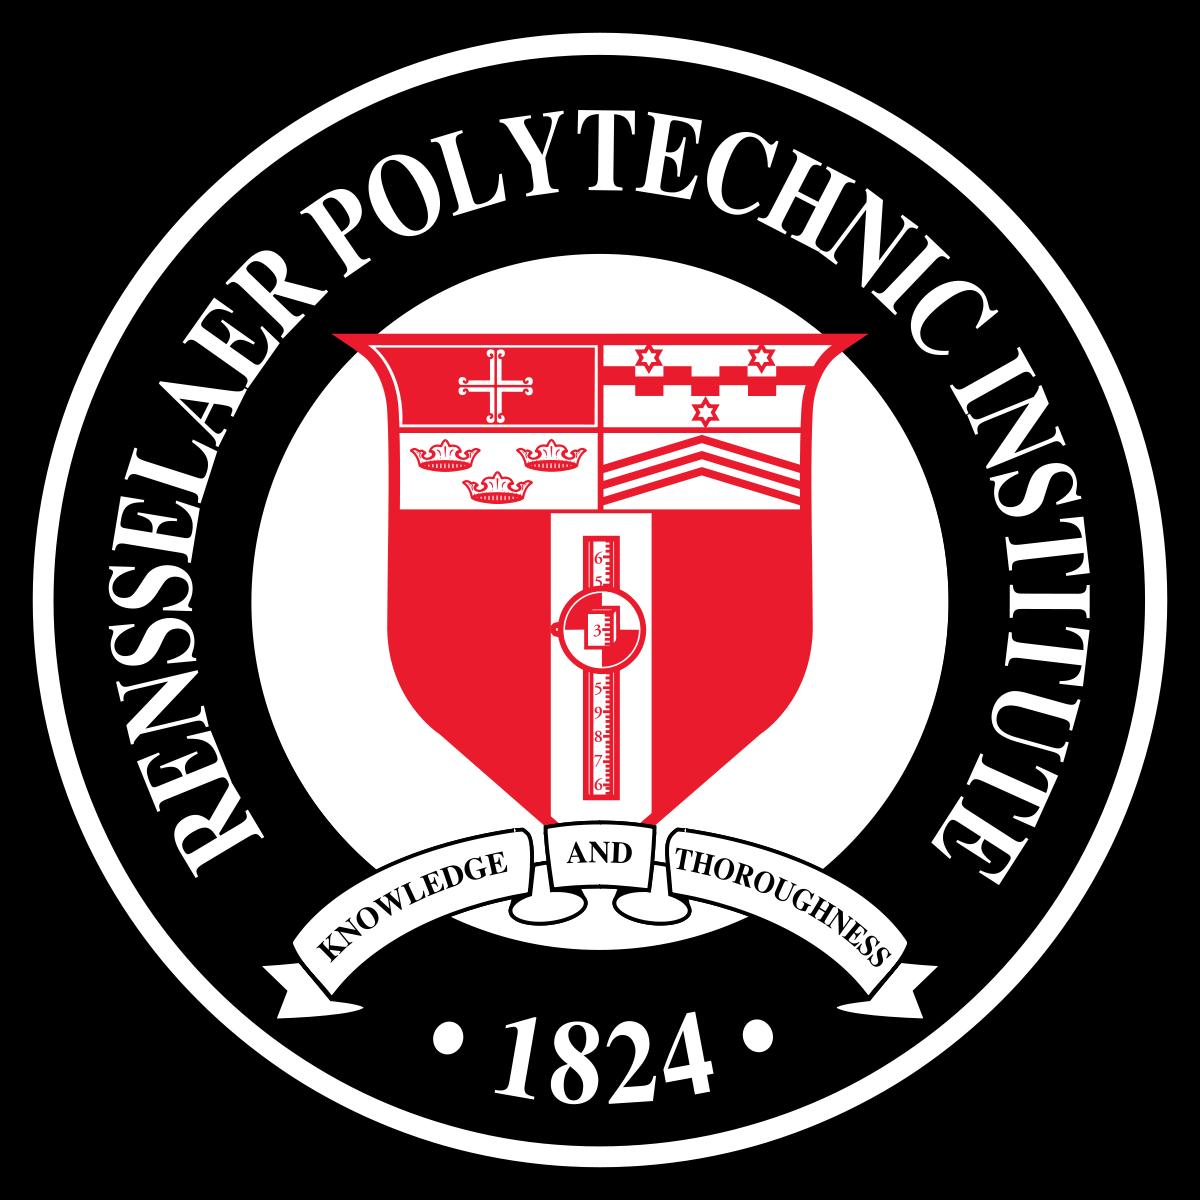 Rensselaer Polytechnic Institute: Science, Technology, & Arts @ Rensselaer Program (STAR)